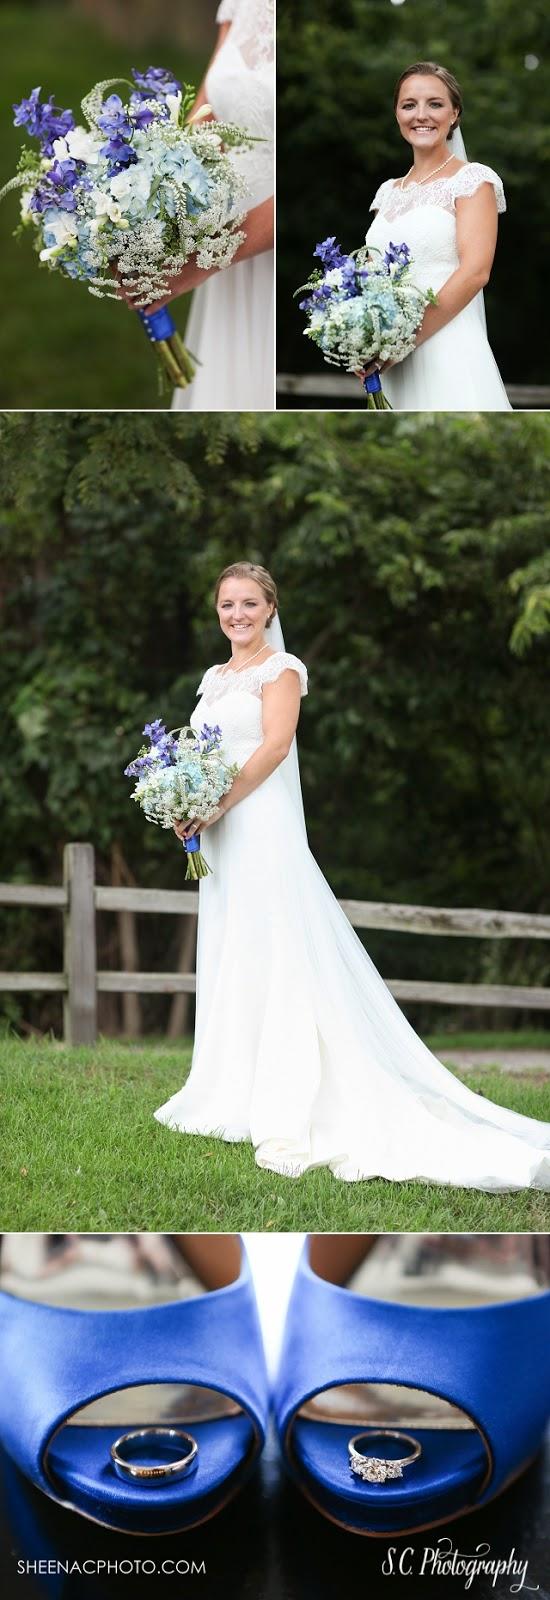 Raimon Bundo lace wedding dress, organza, blue wedding shoes, ring shot